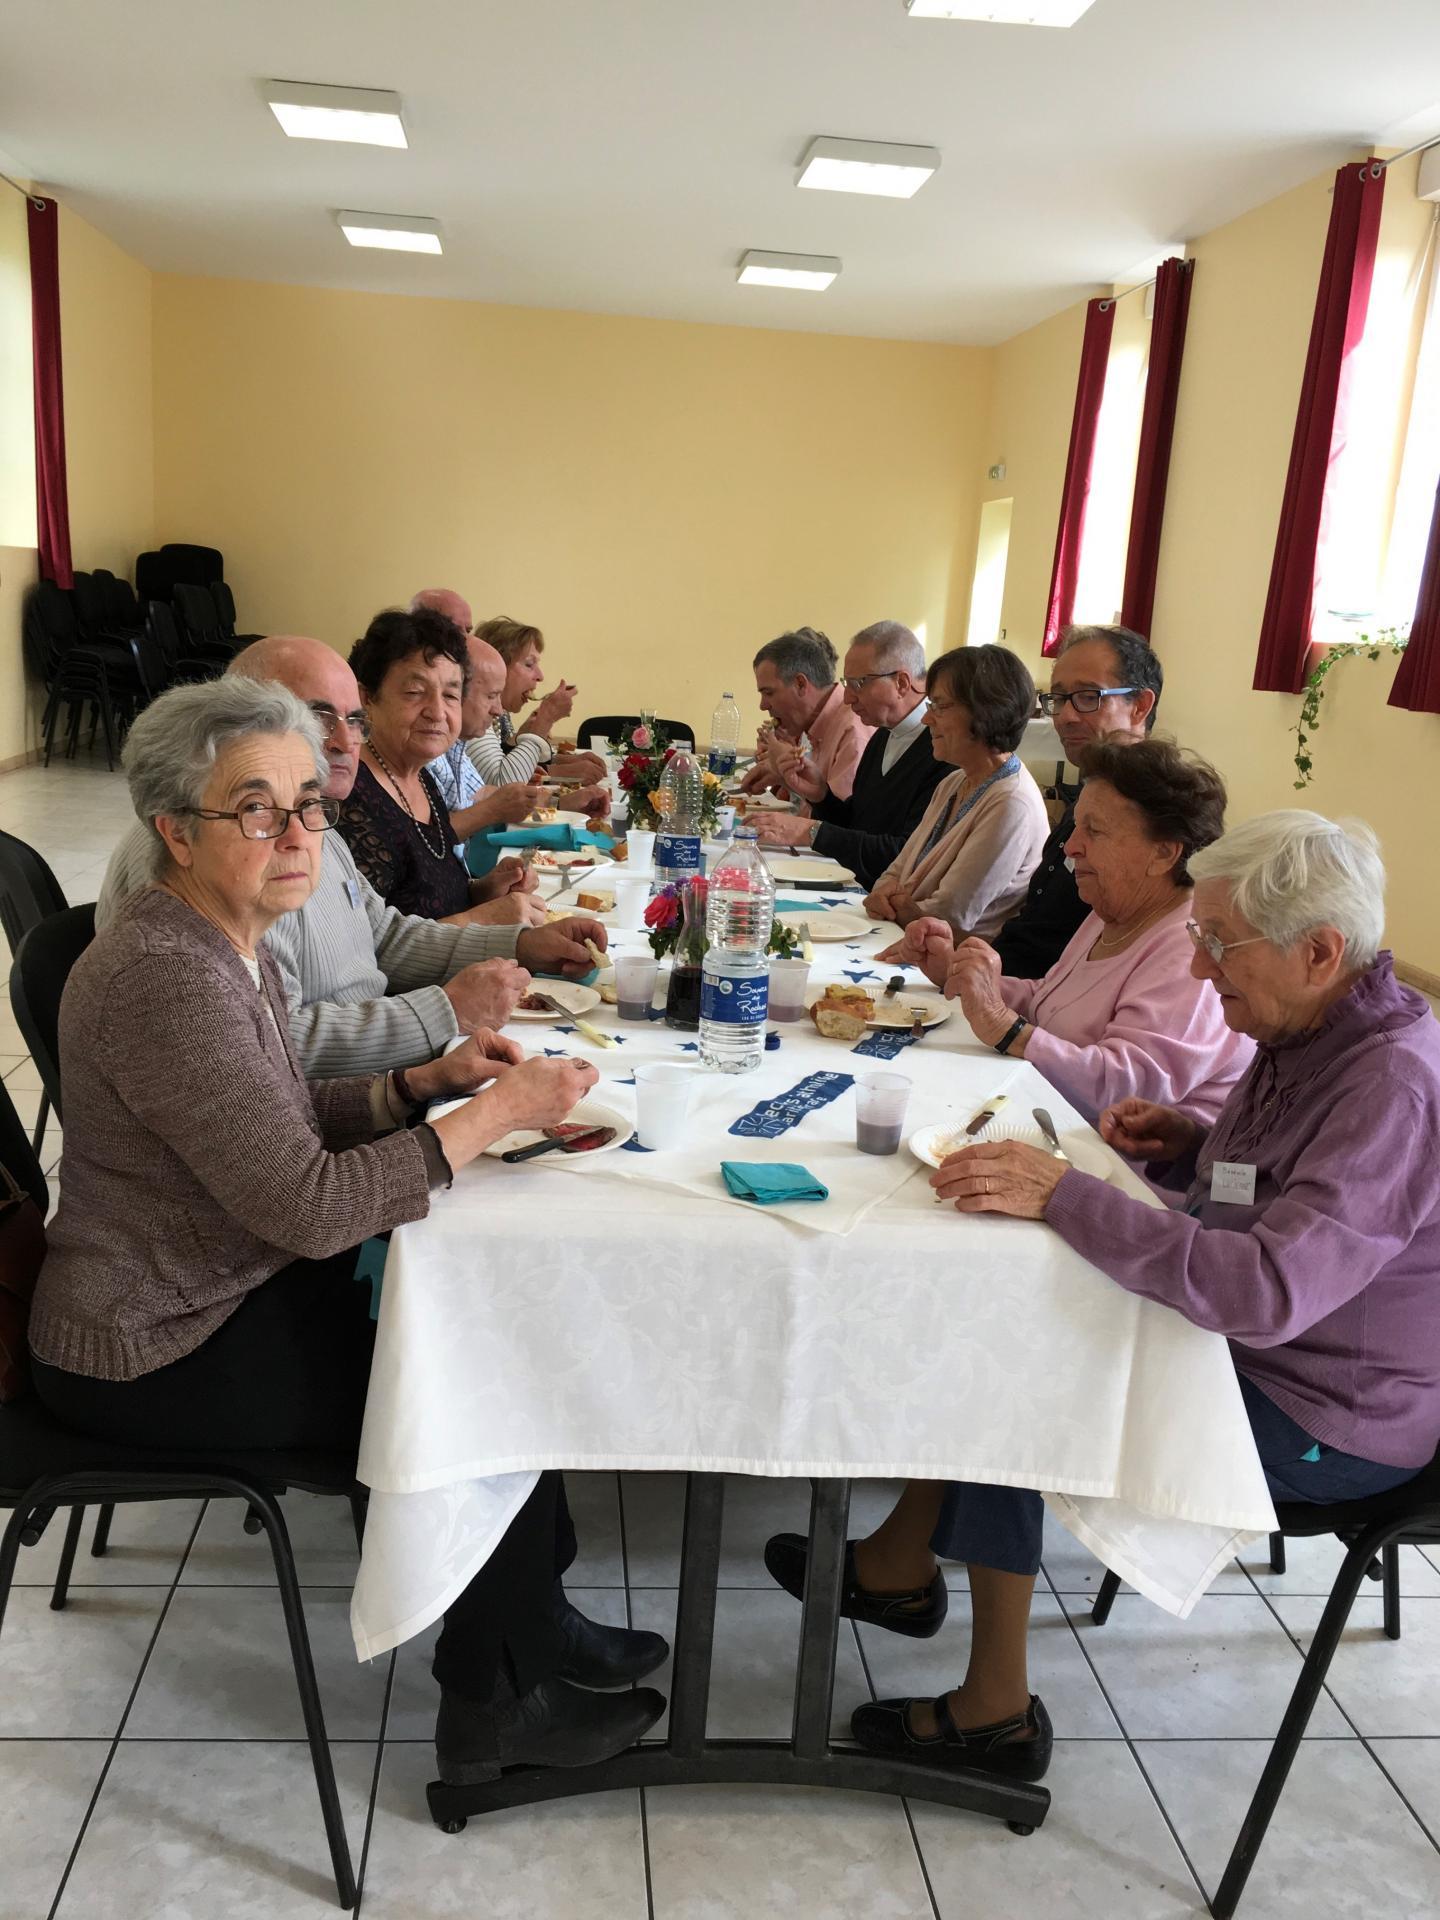 Inauguration secours catholique 4